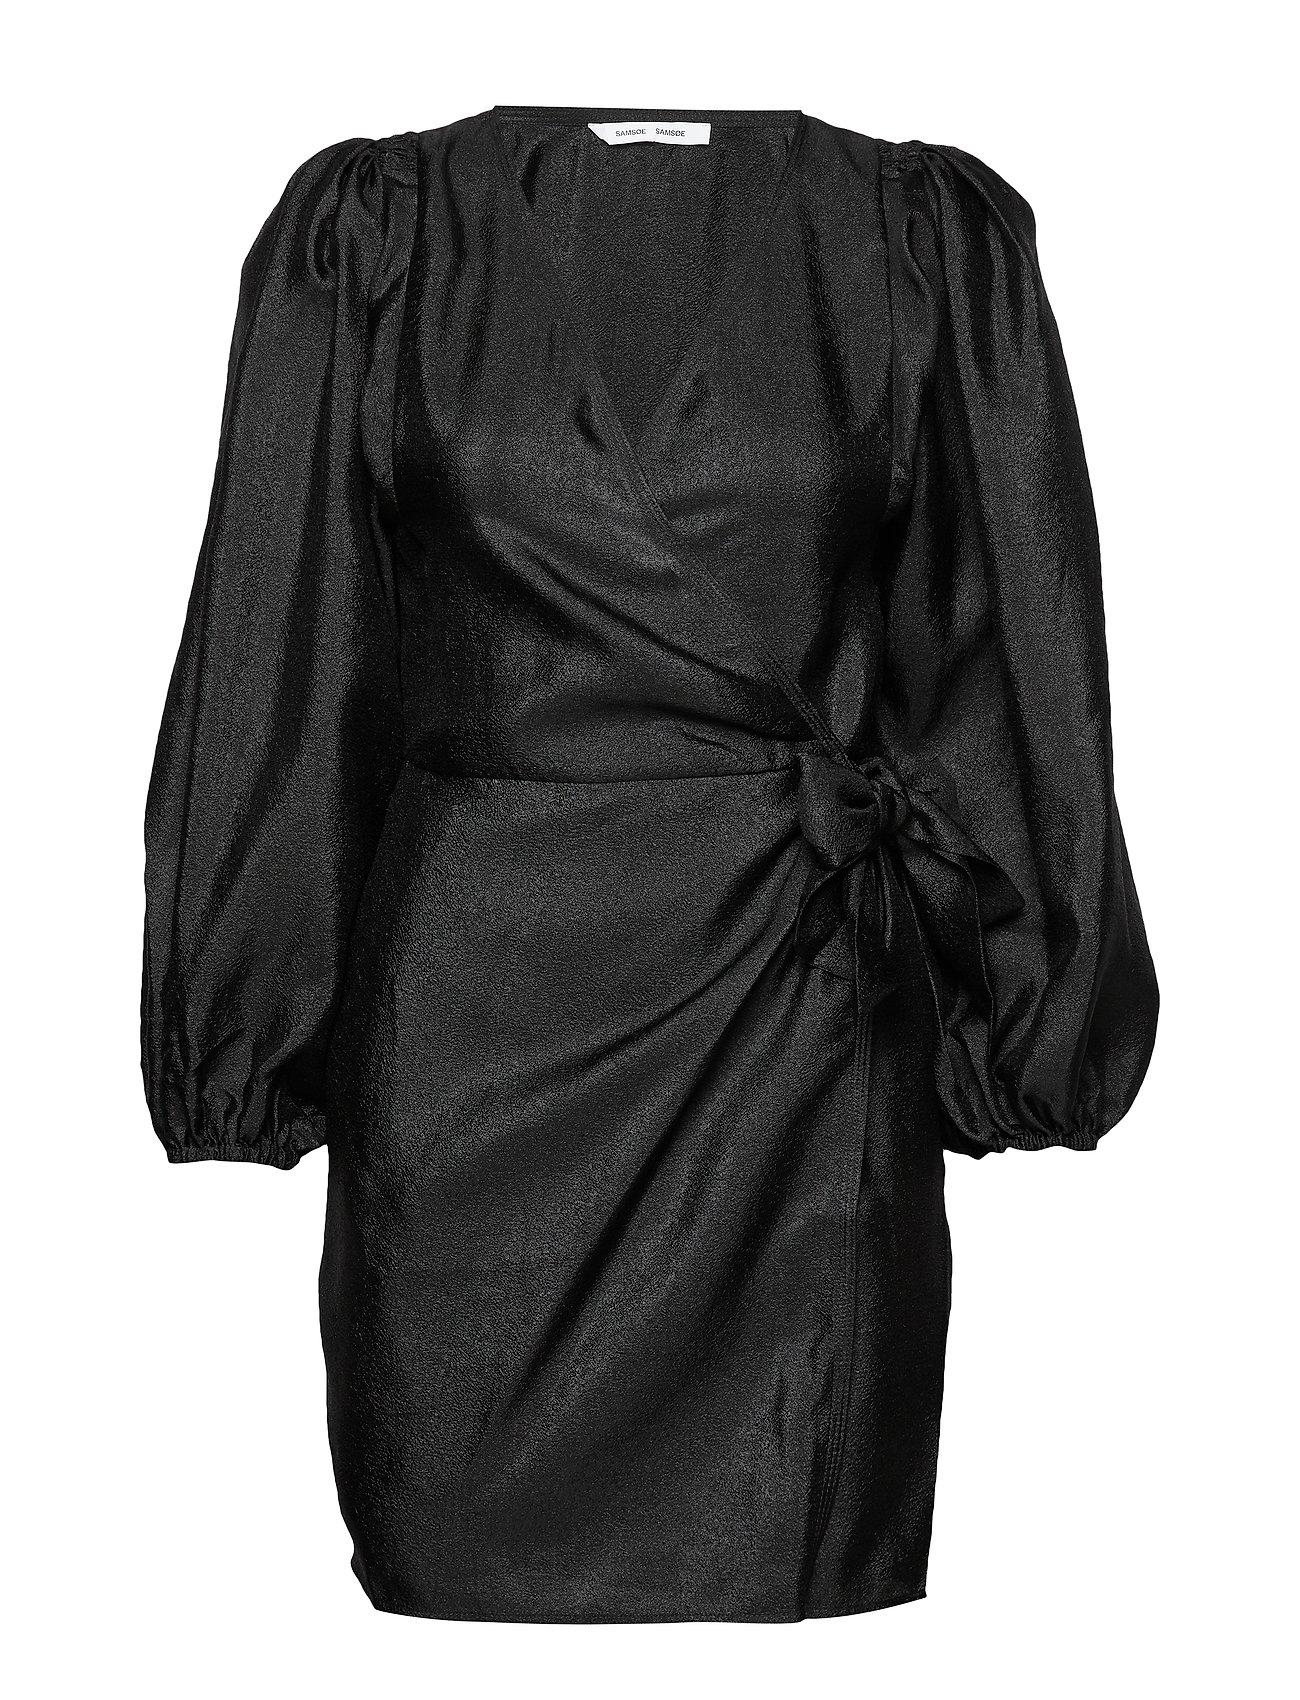 Samsøe & Samsøe Magnolia short dress 11244 - BLACK